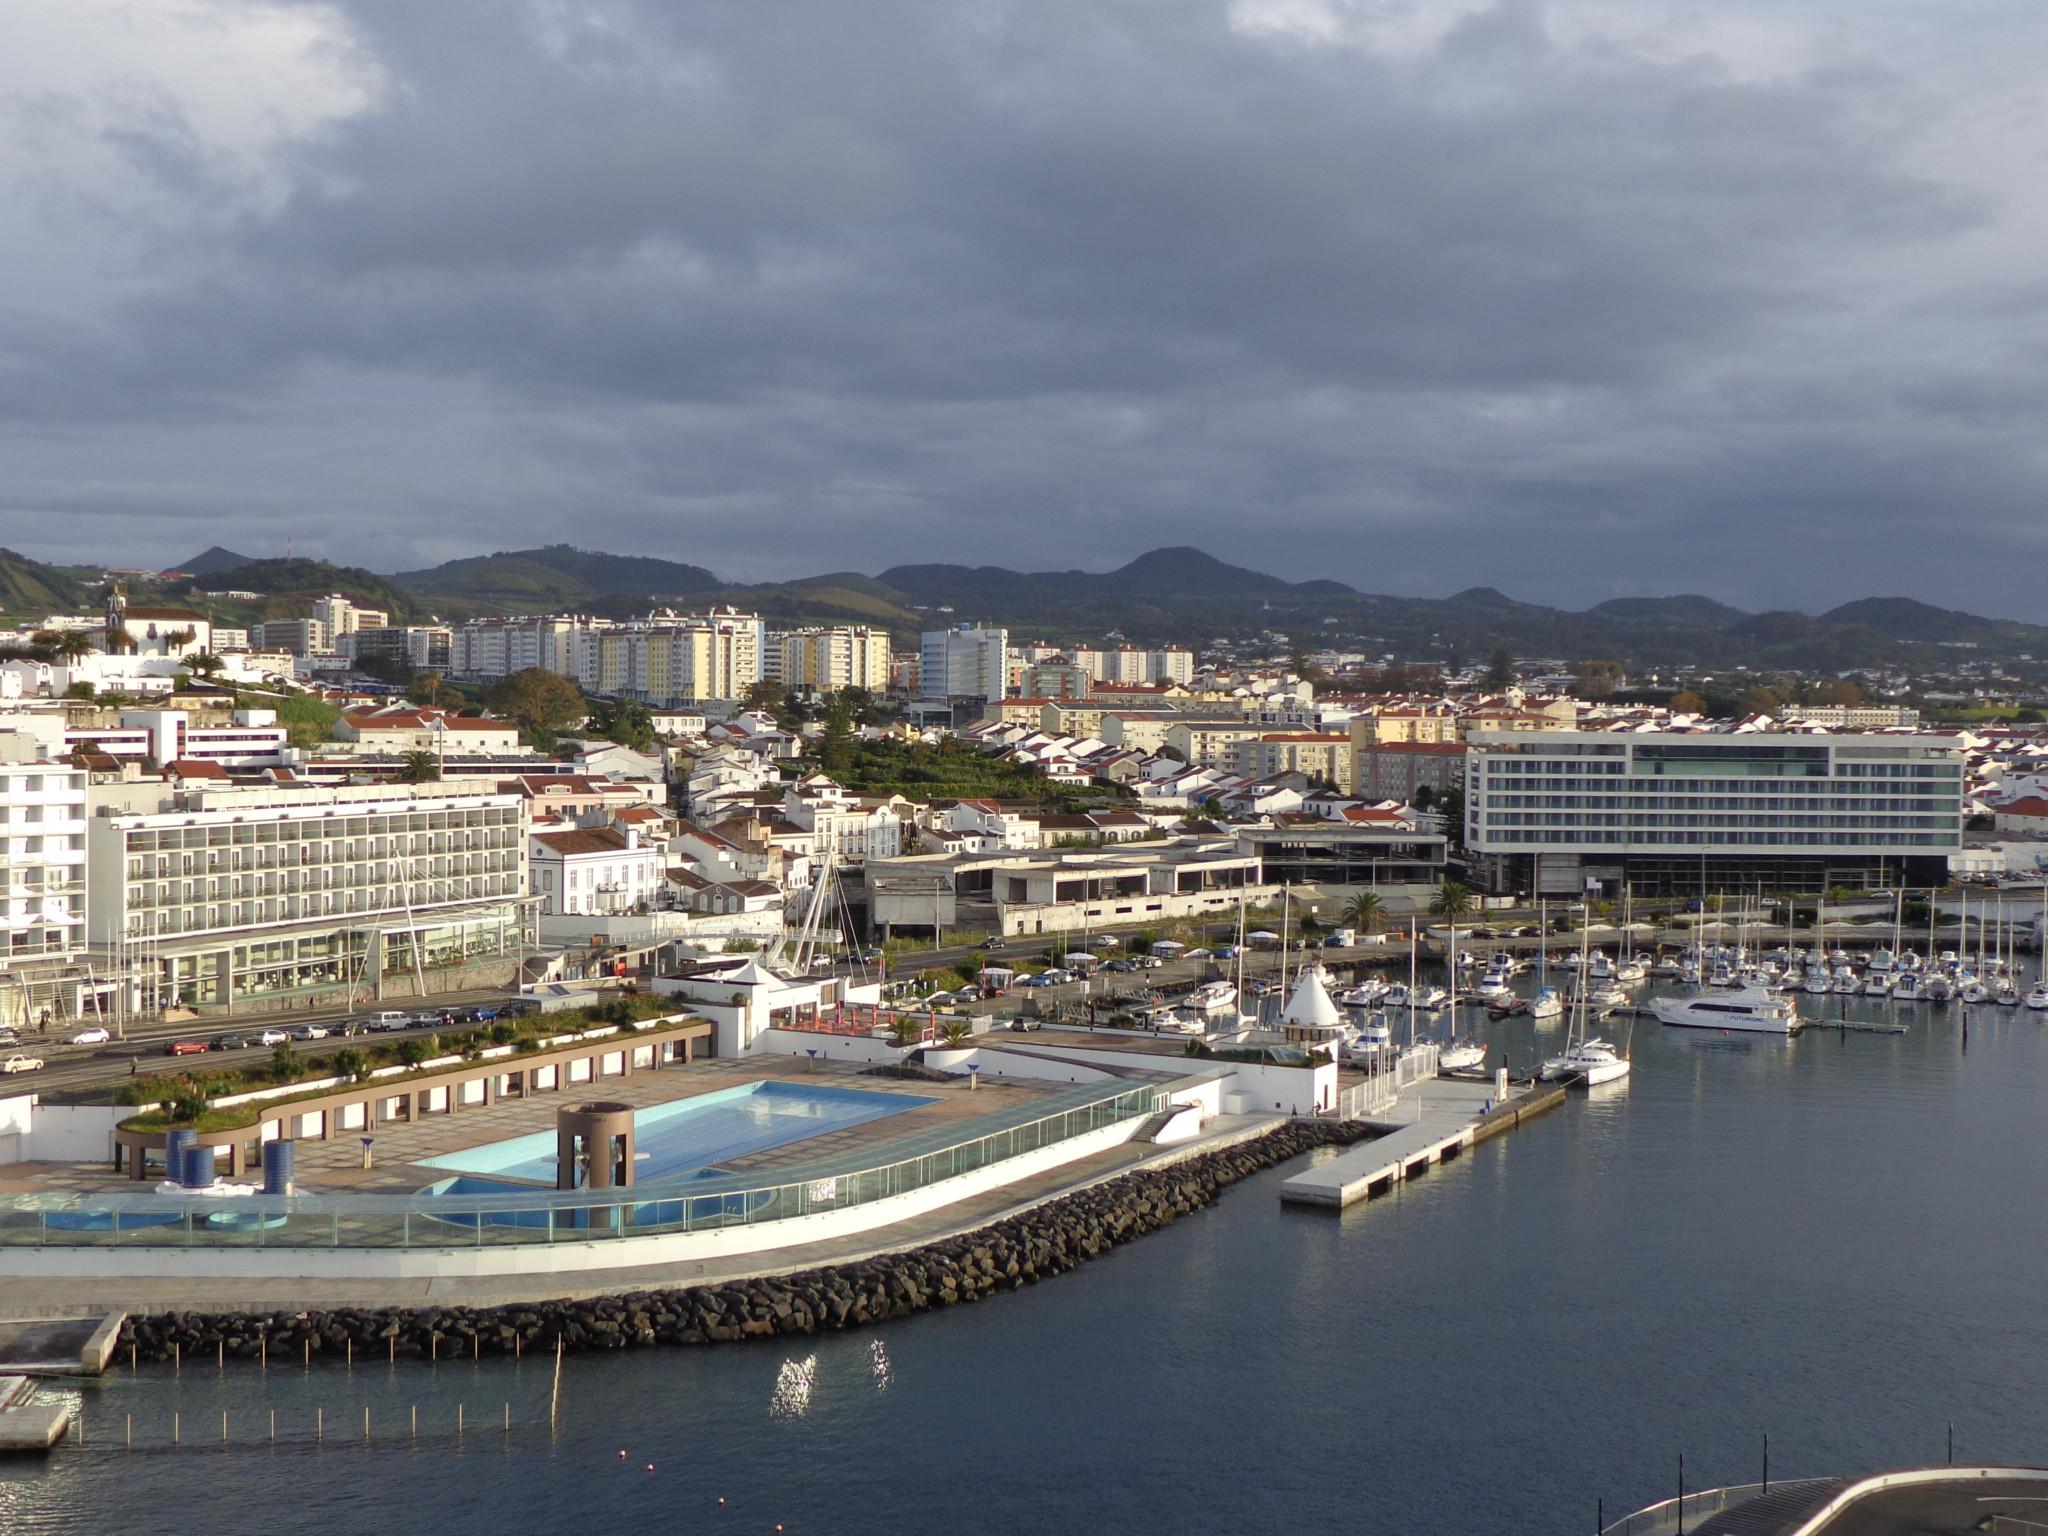 Azores Harbor